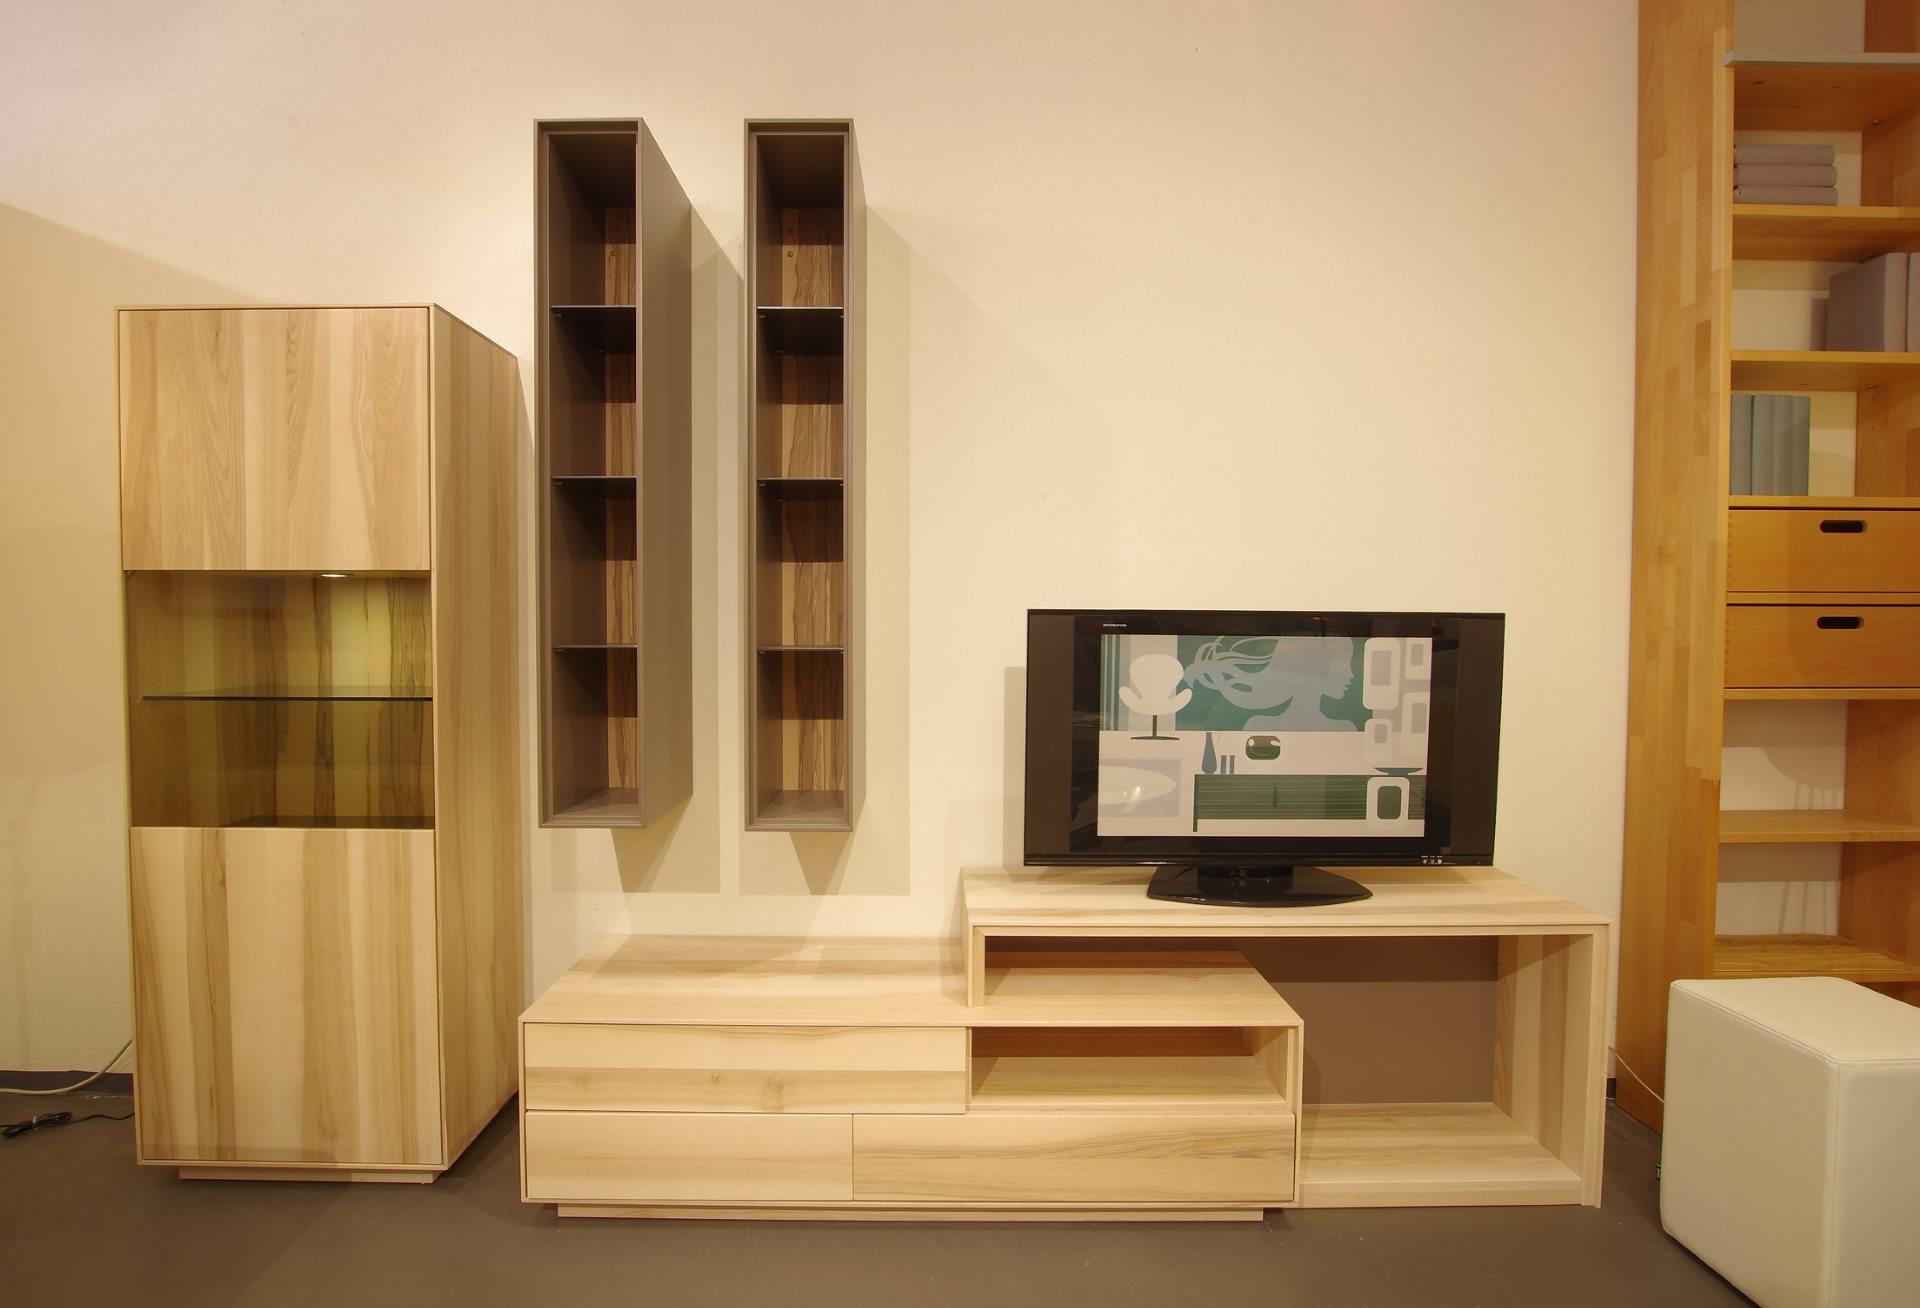 Moderne Wohnwand Puro in Kernesche weiss geölt